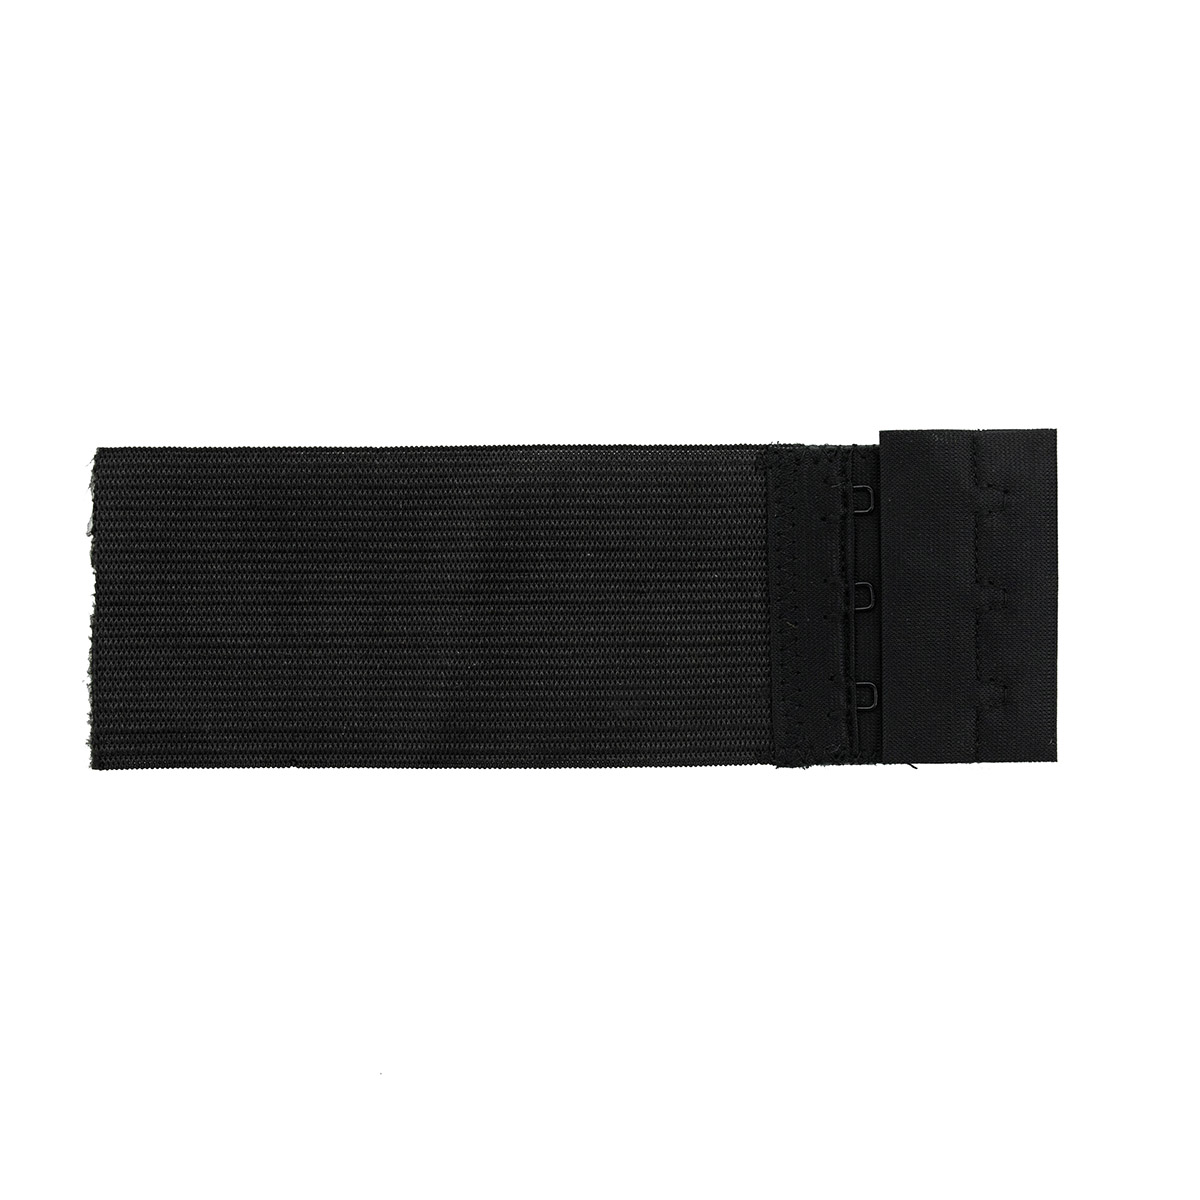 Застежка для бюстгальтера 50мм, 3 крючка, 1 шт., черный 853101, Hobby&Pro